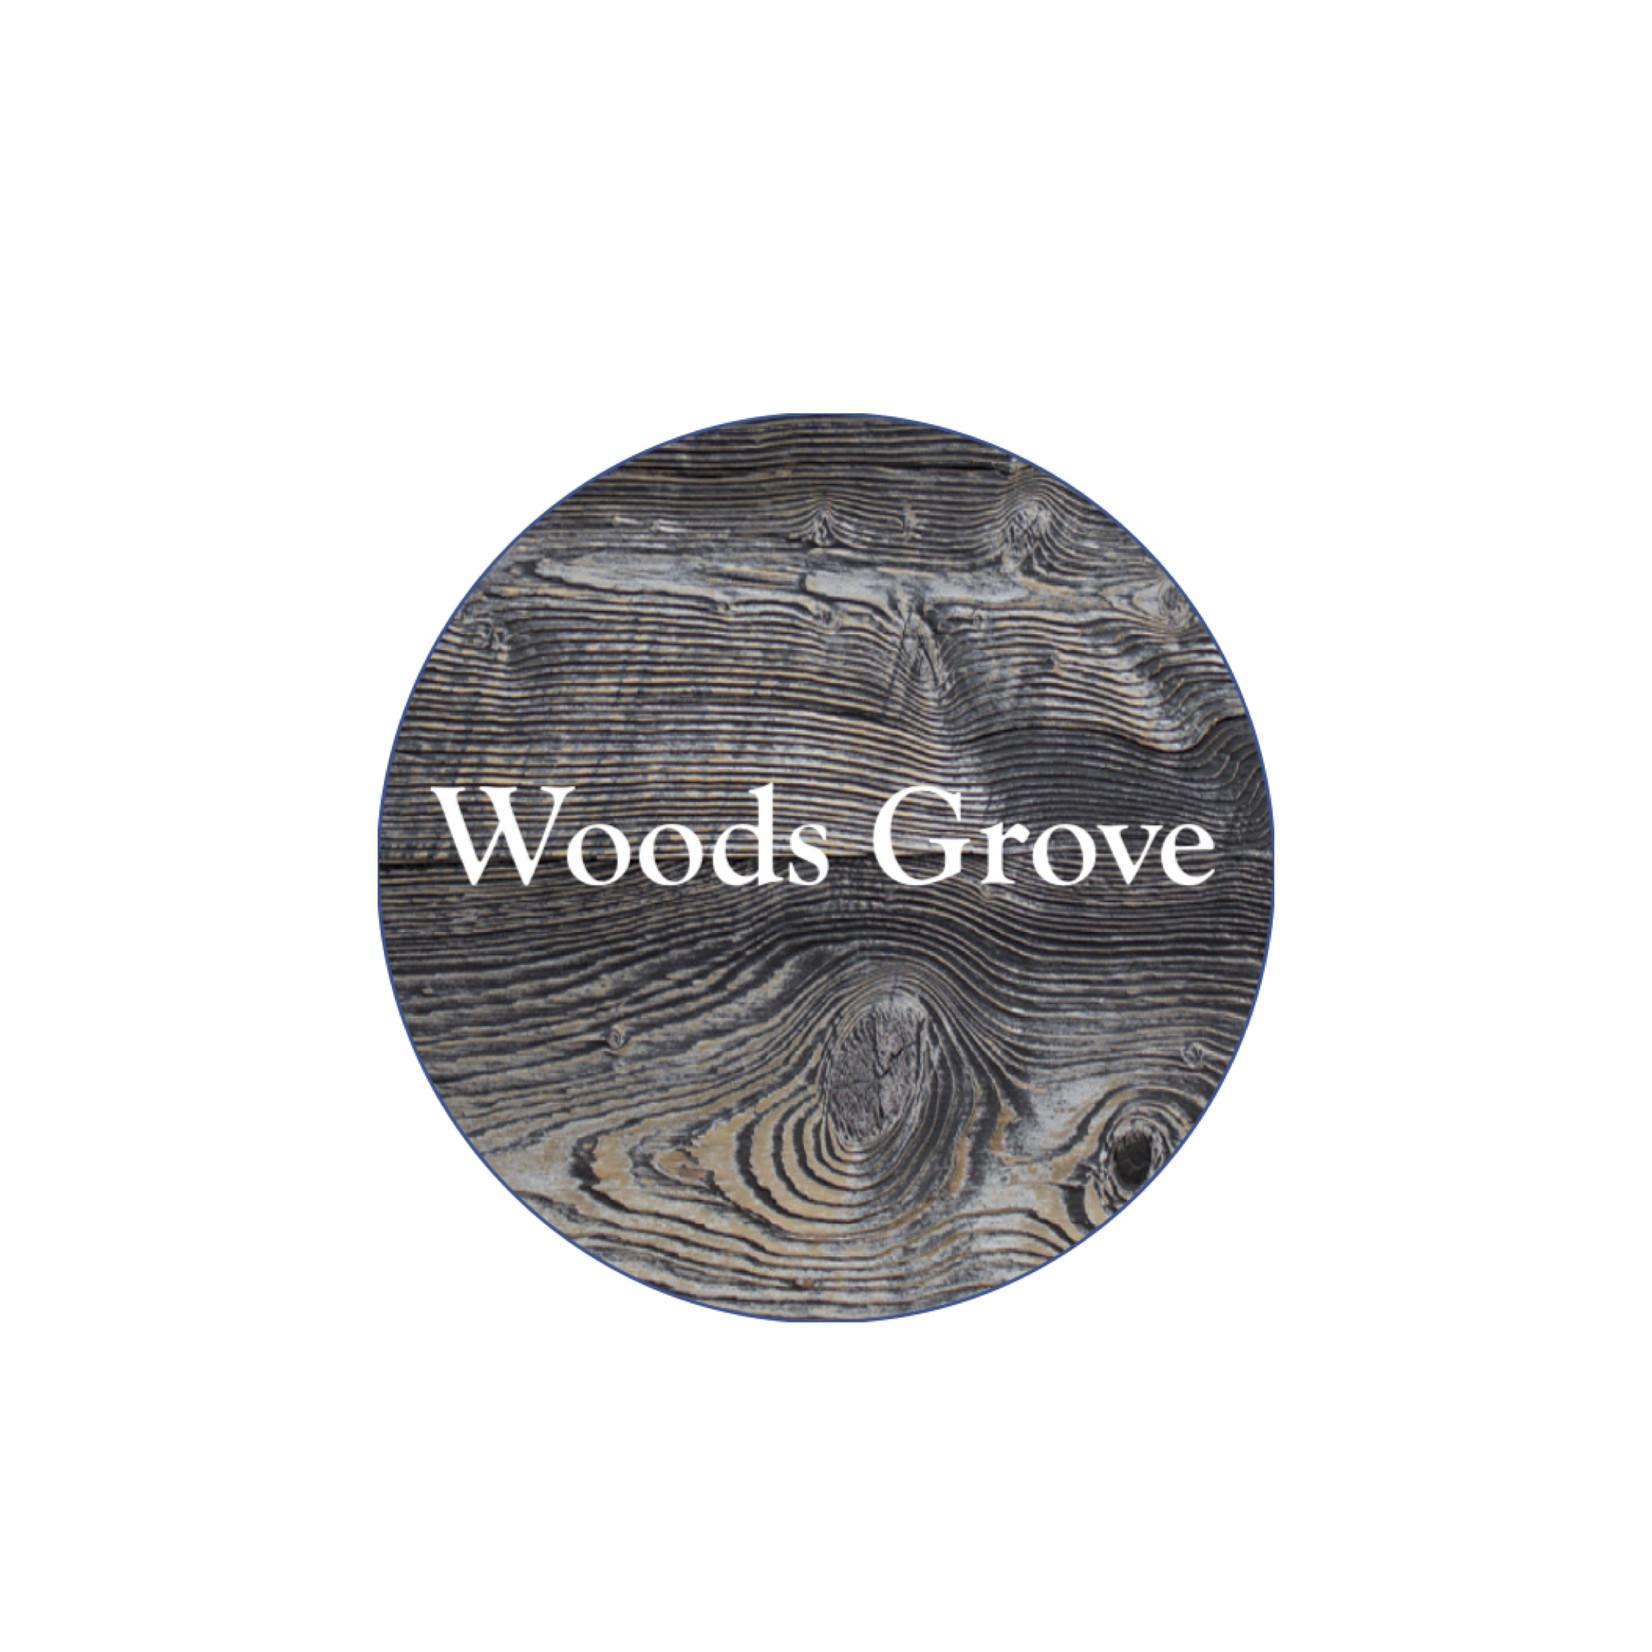 Woods Grove Woods Grove Gift Card